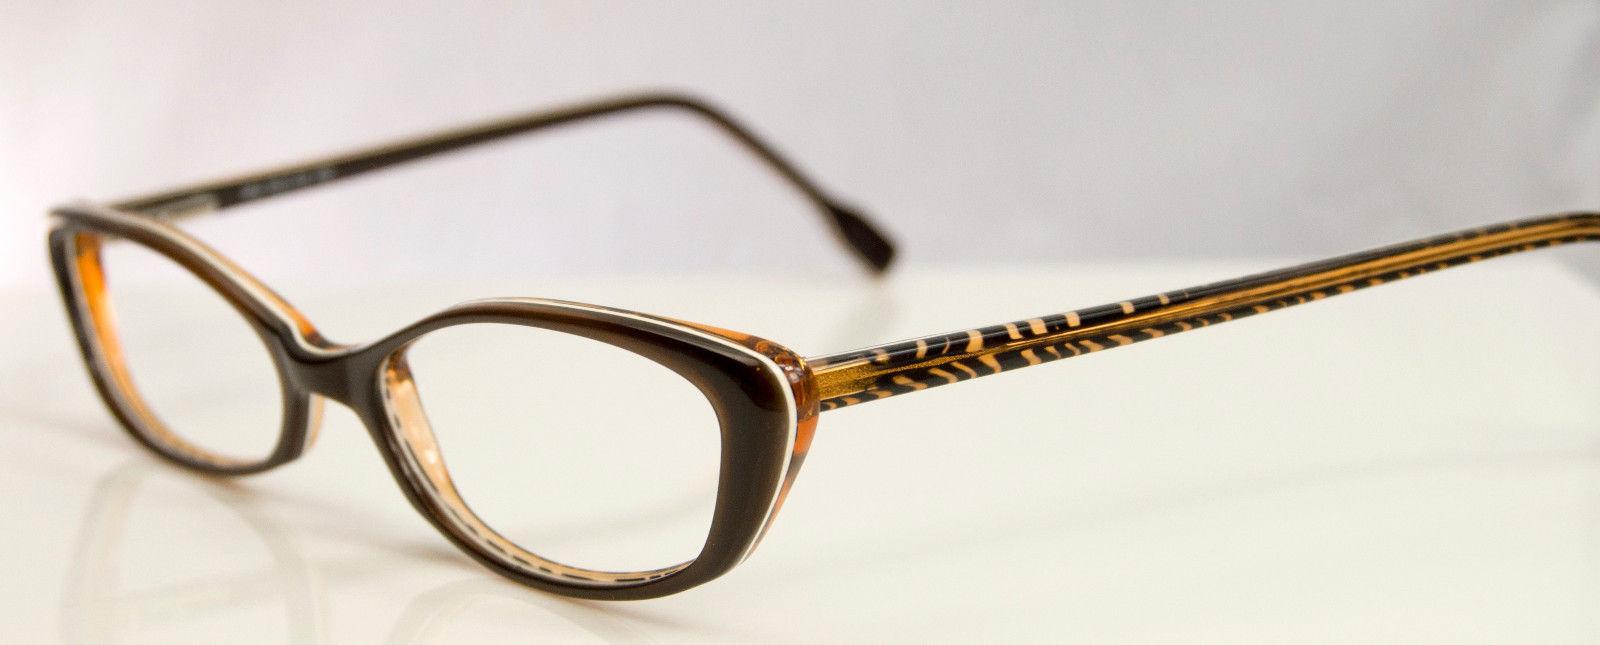 Custom Made Eyeglass Frames New York : Vintage EX 1813 Made in Italy Eyeglass Frames 50-16-135 ...